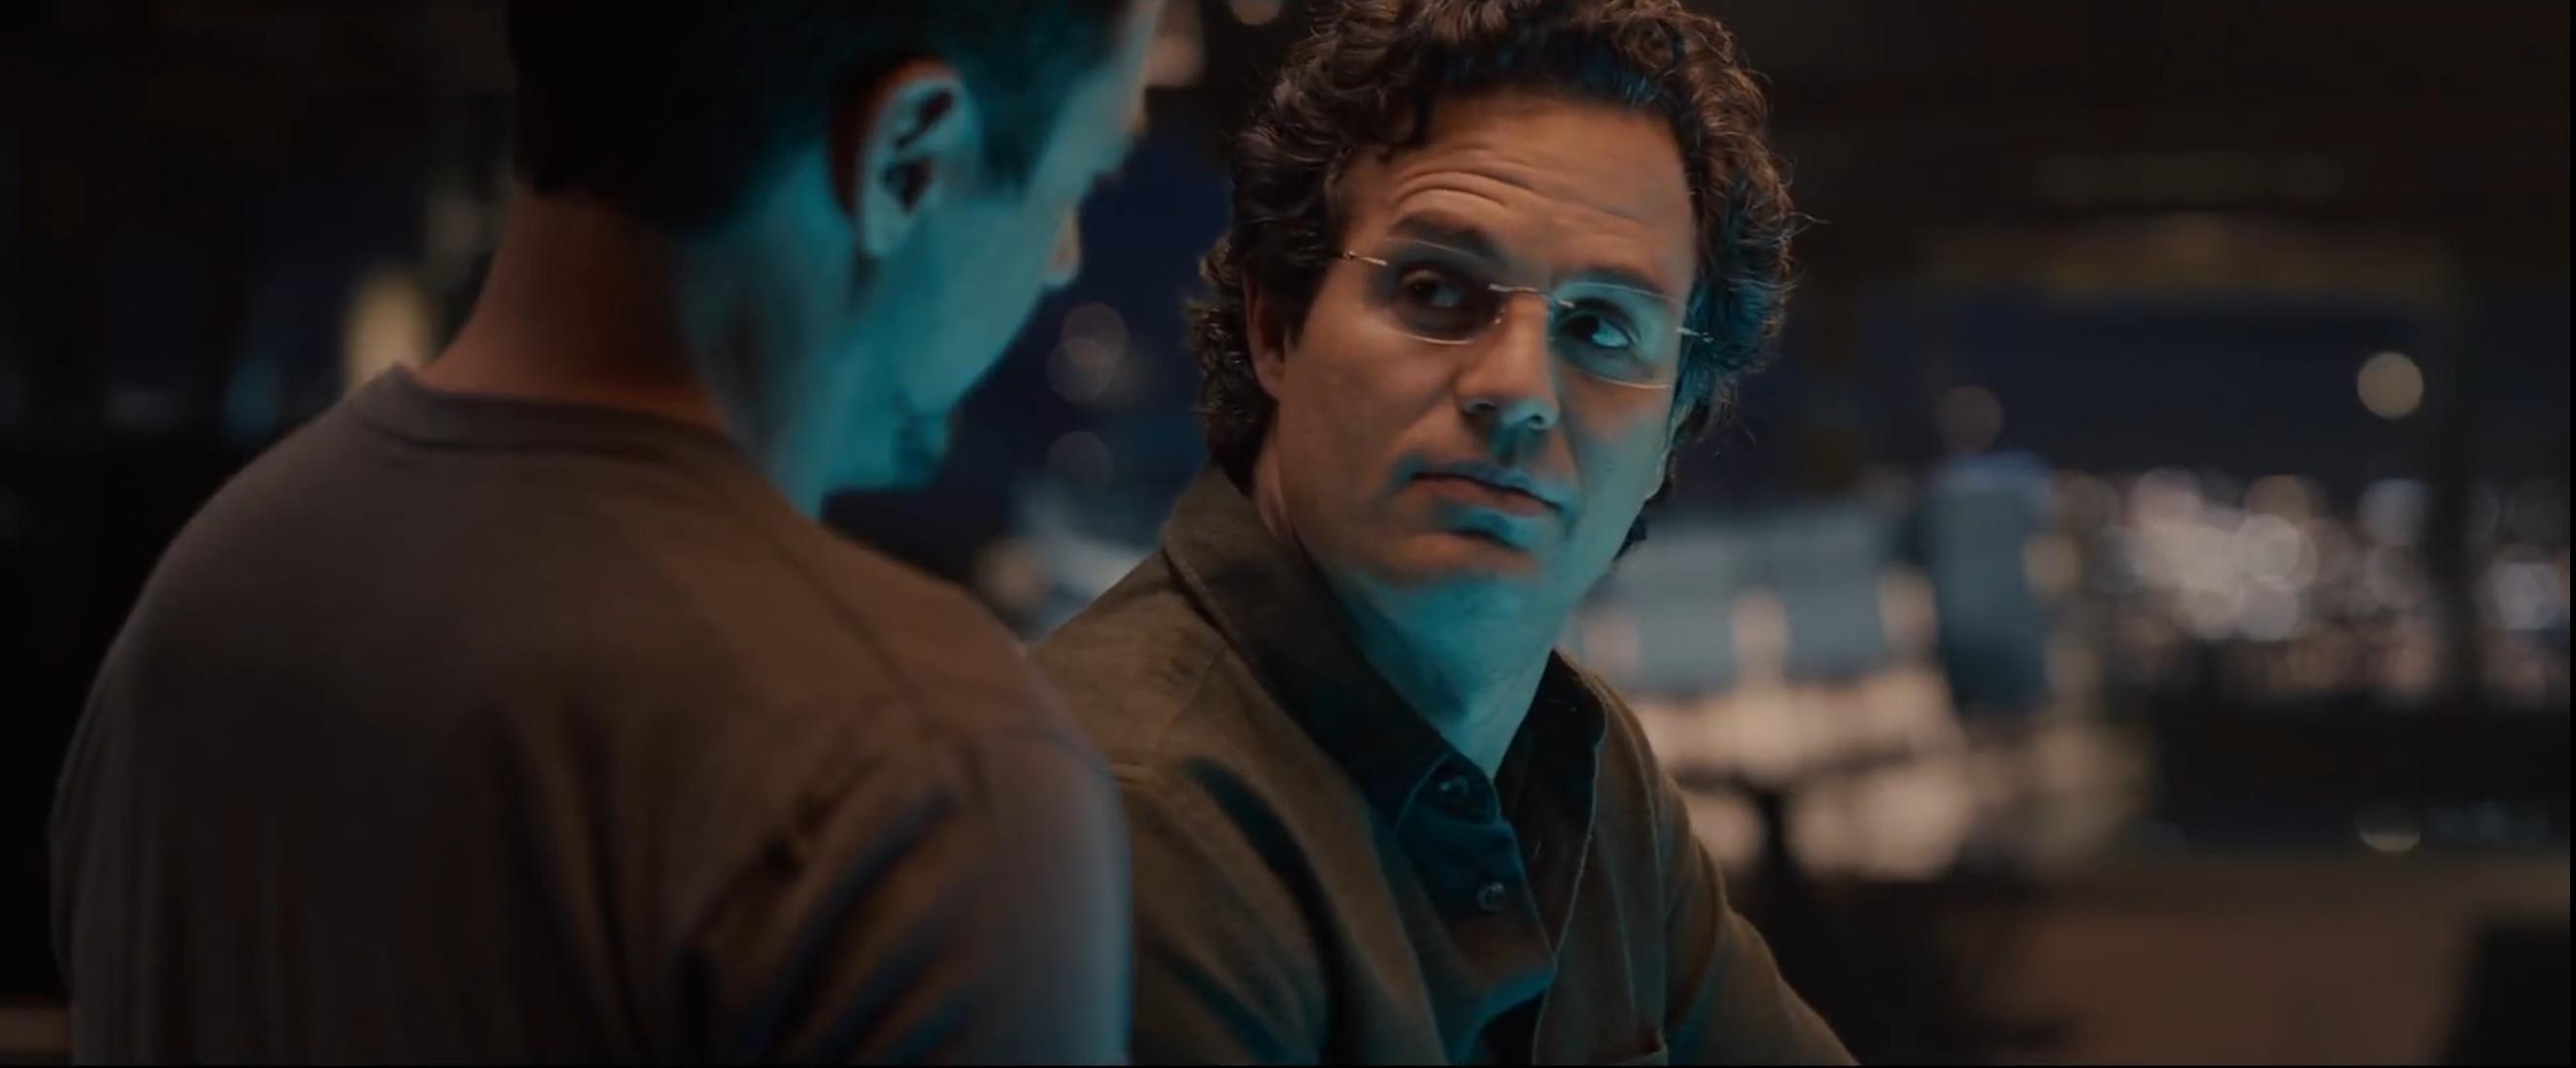 Avengers: Age of Ultron - Mark Ruffalo in un'immagine dal trailer